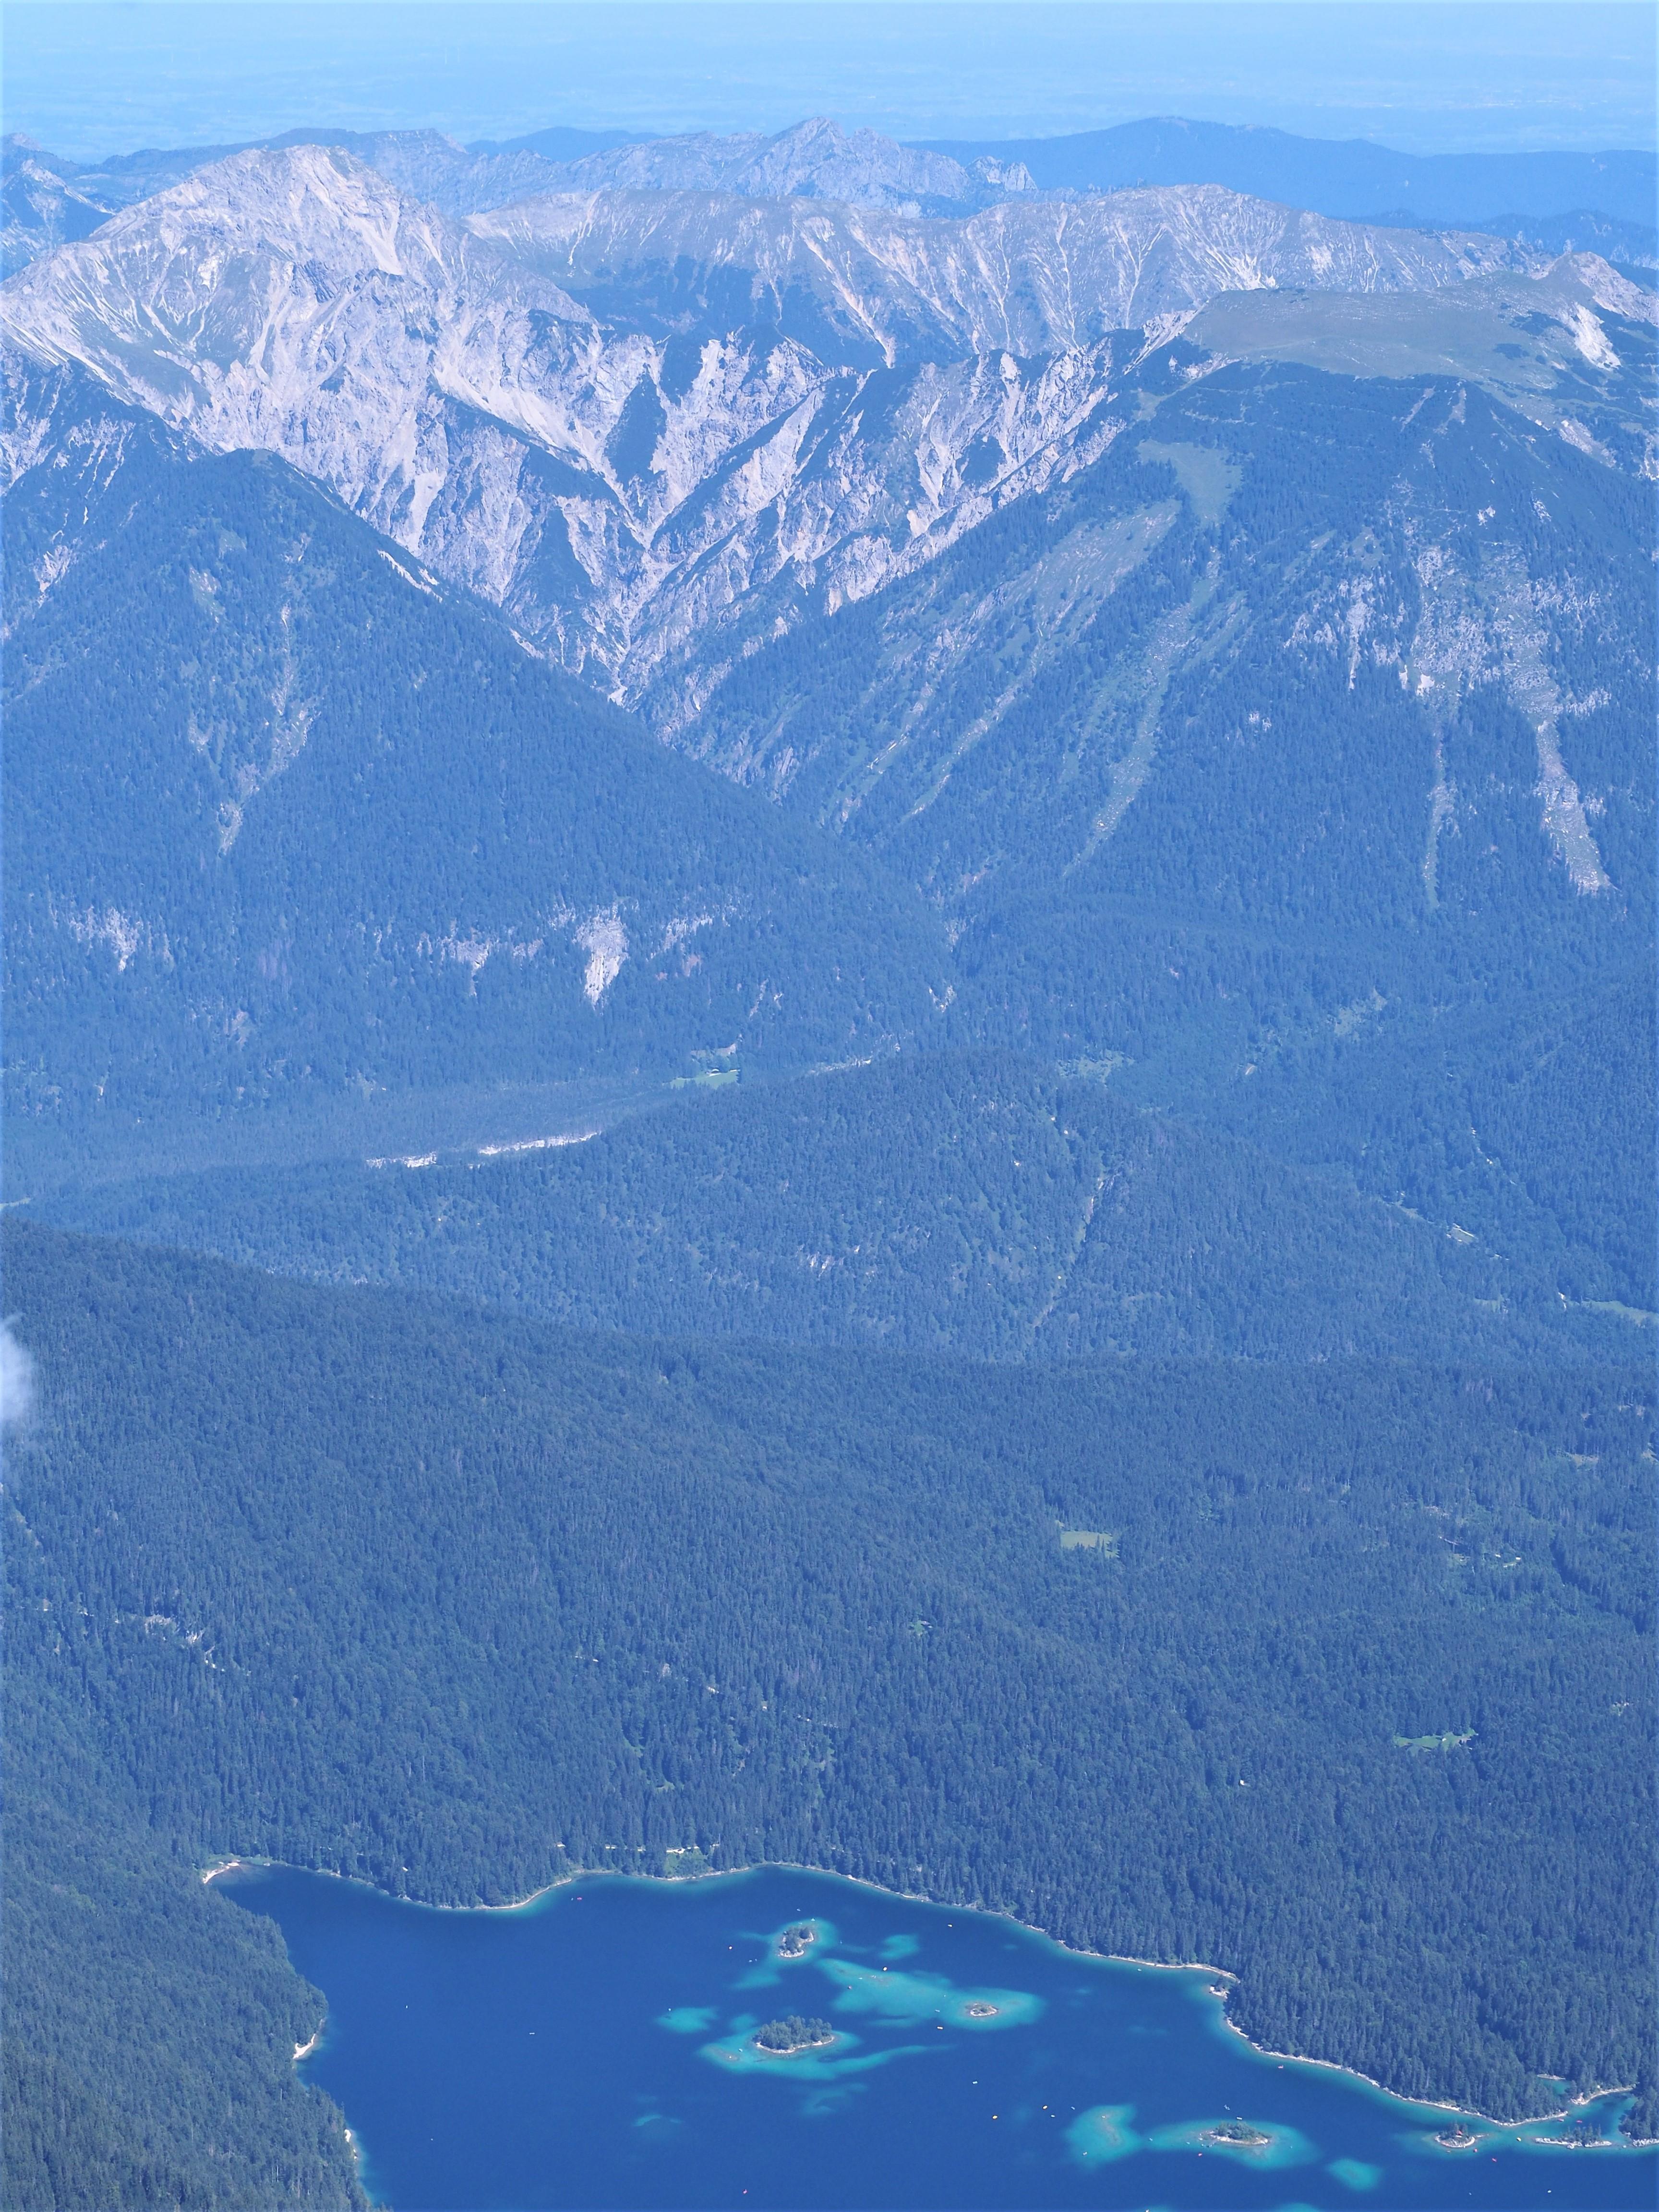 Zugspitze-BLOG-VOYAGE-clioandco-allemagne-autriche-lac-Eibsee-vue-autre